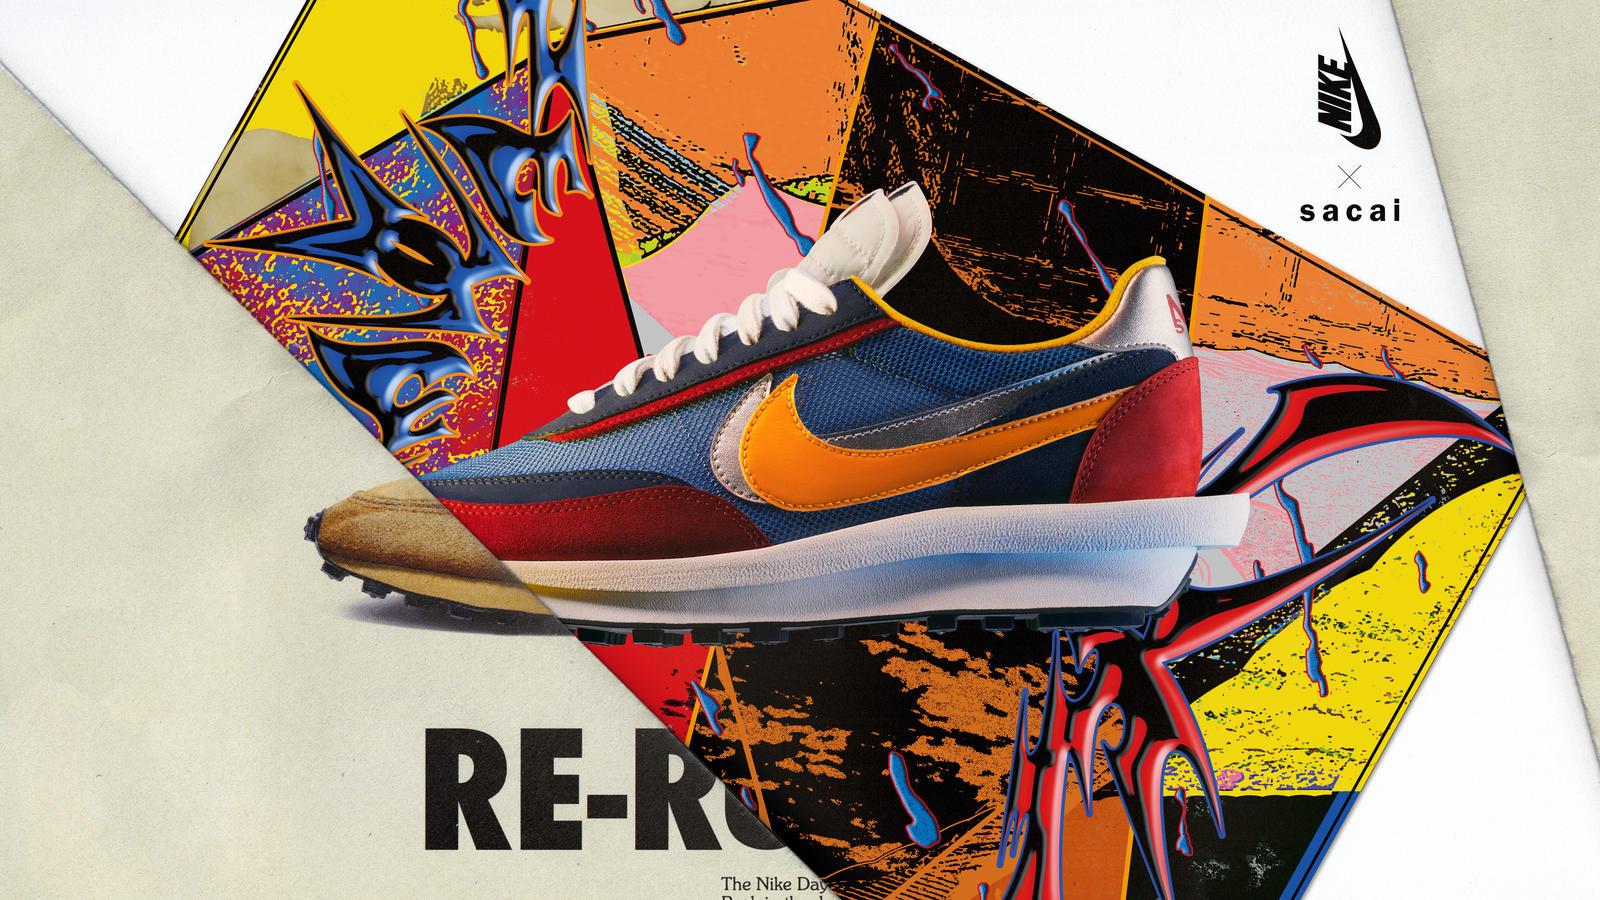 How to Get the Nike x sacai LDWaffle and Blazer Mid 7